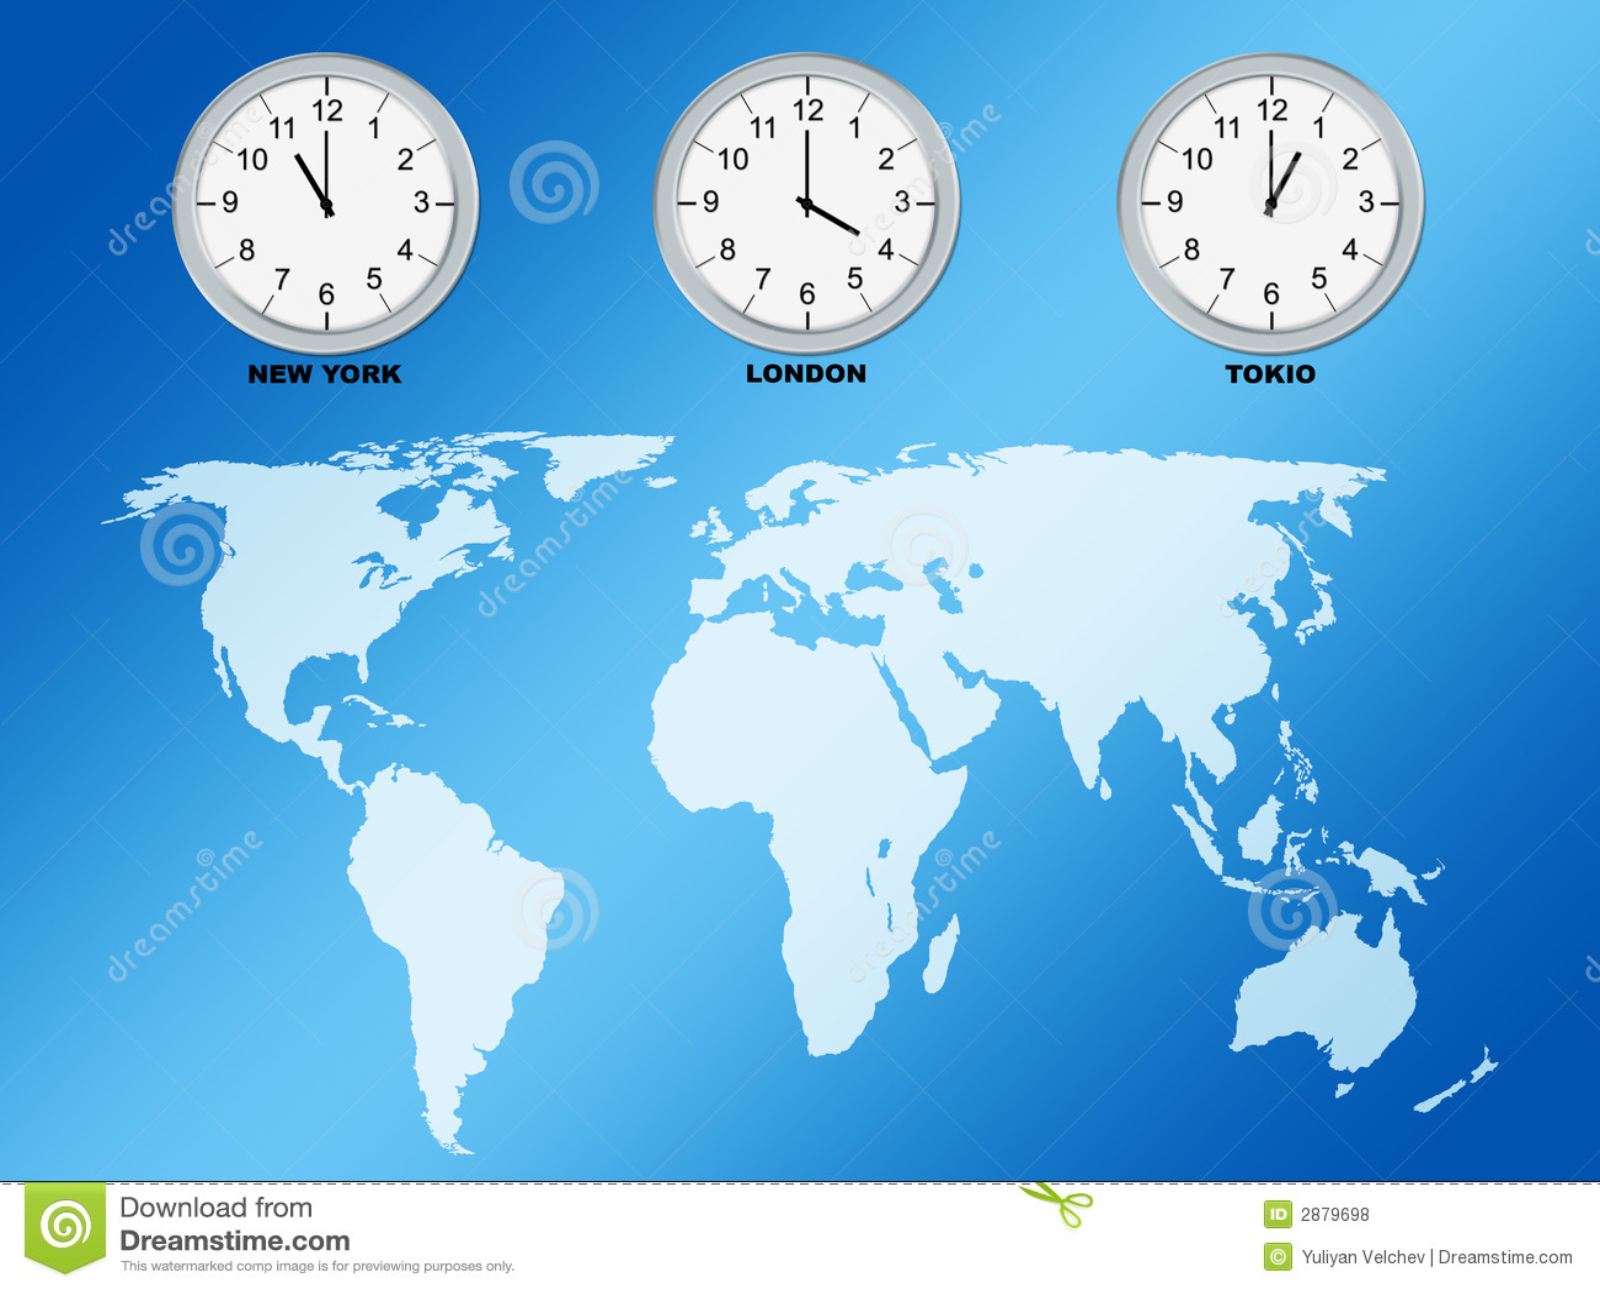 Clock World Map.World Map And Clocks Stock Illustration Illustration Of Earth 2879698